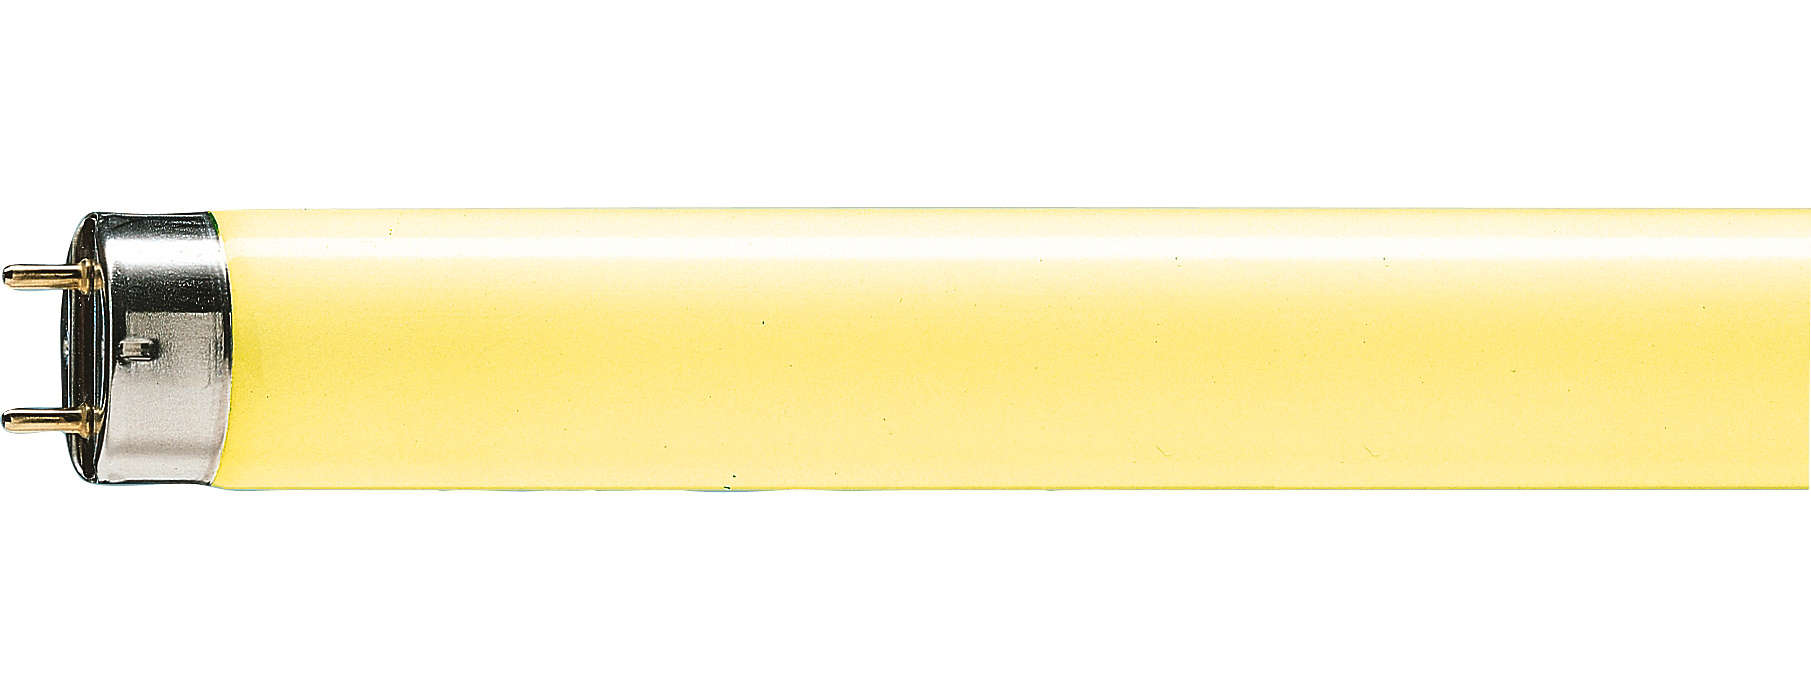 Farbige Leuchtstofflampen